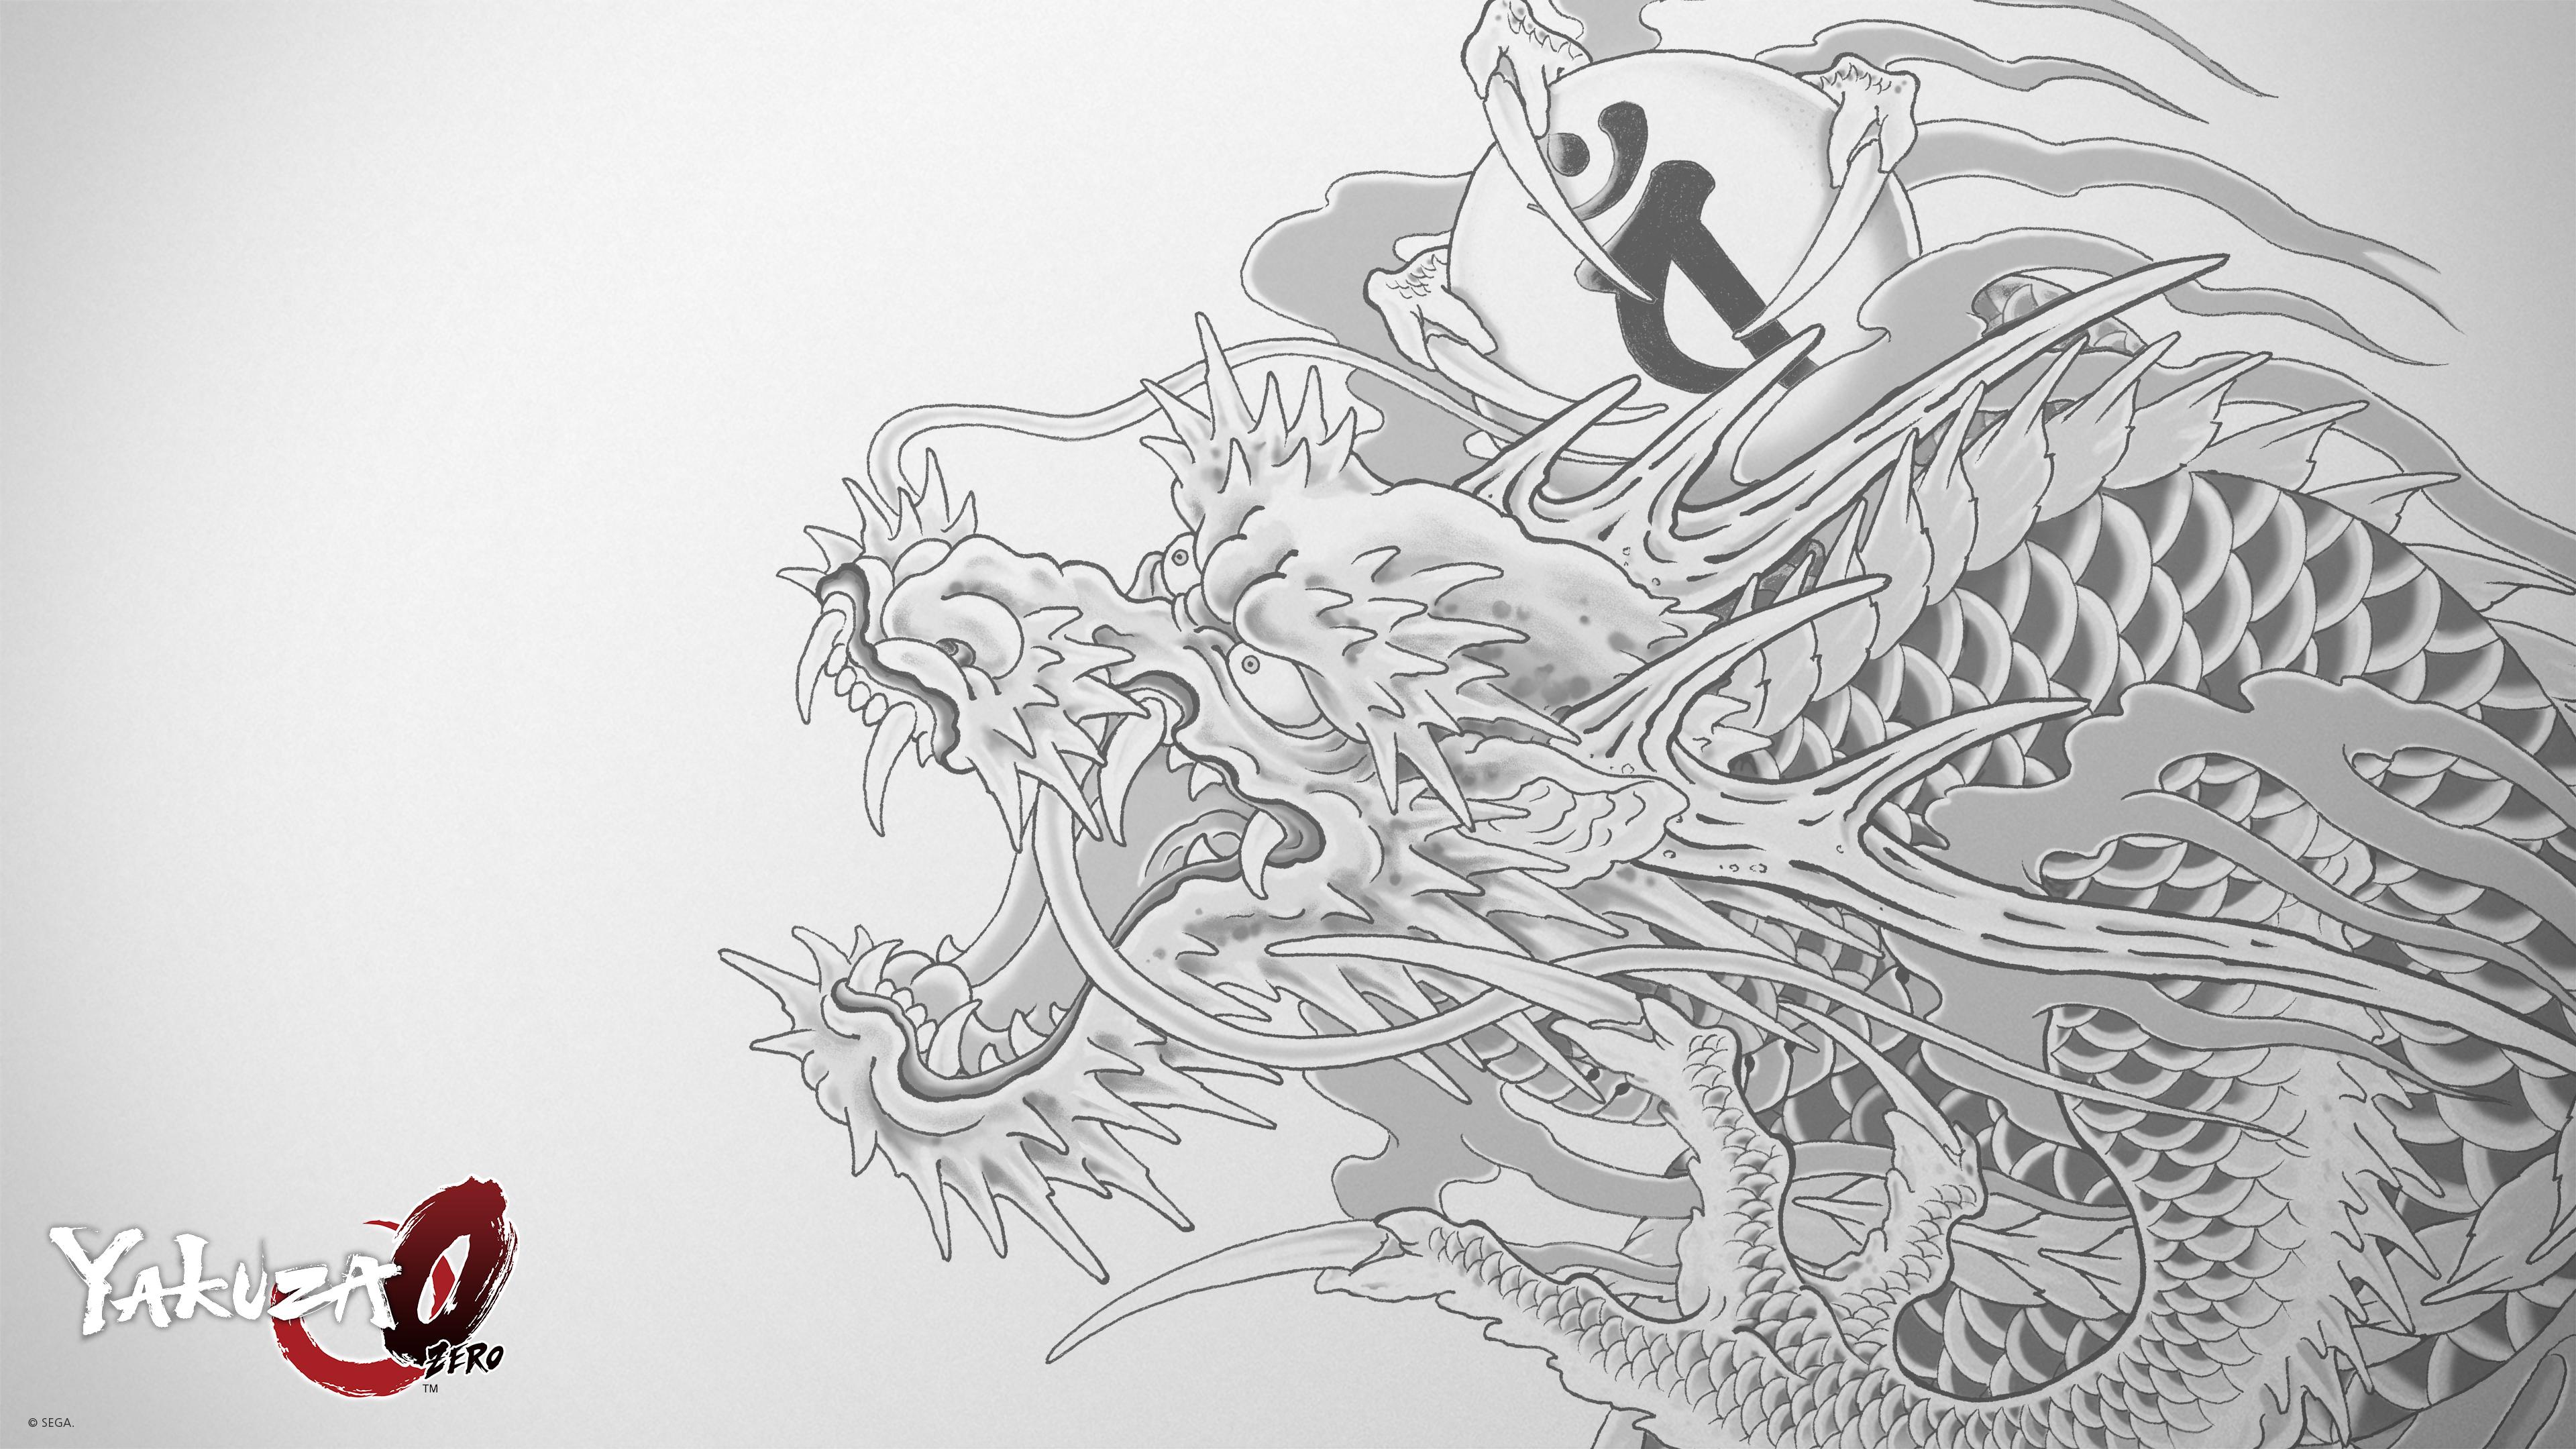 Yakuza 0 Tattoo 4k Ultra Fondo De Pantalla Hd Fondo De